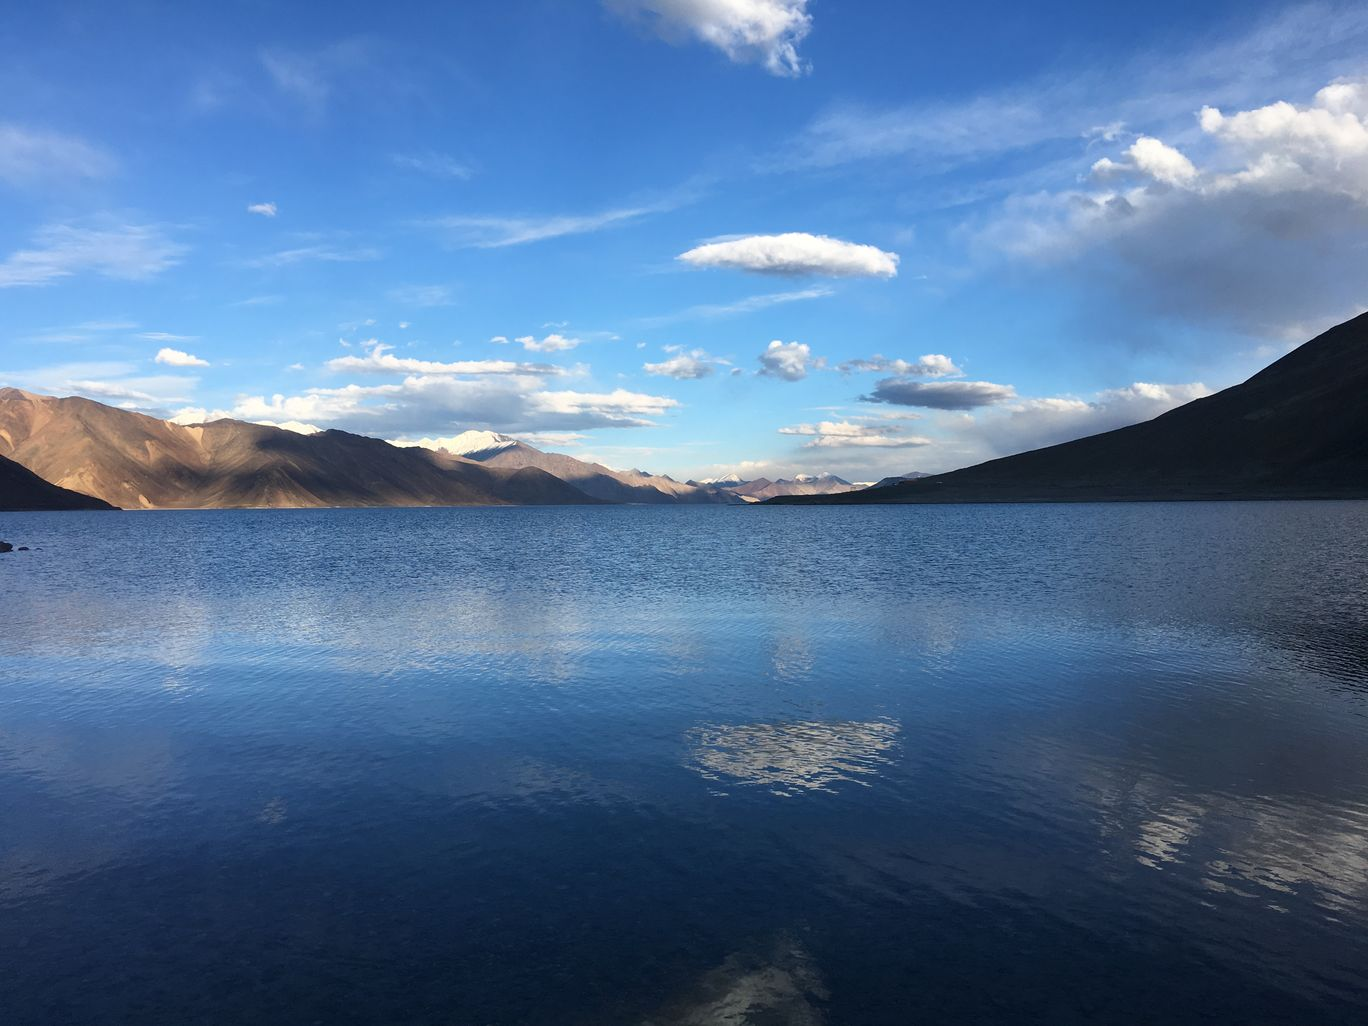 Photo of Pangong Lake By Somya Mathur